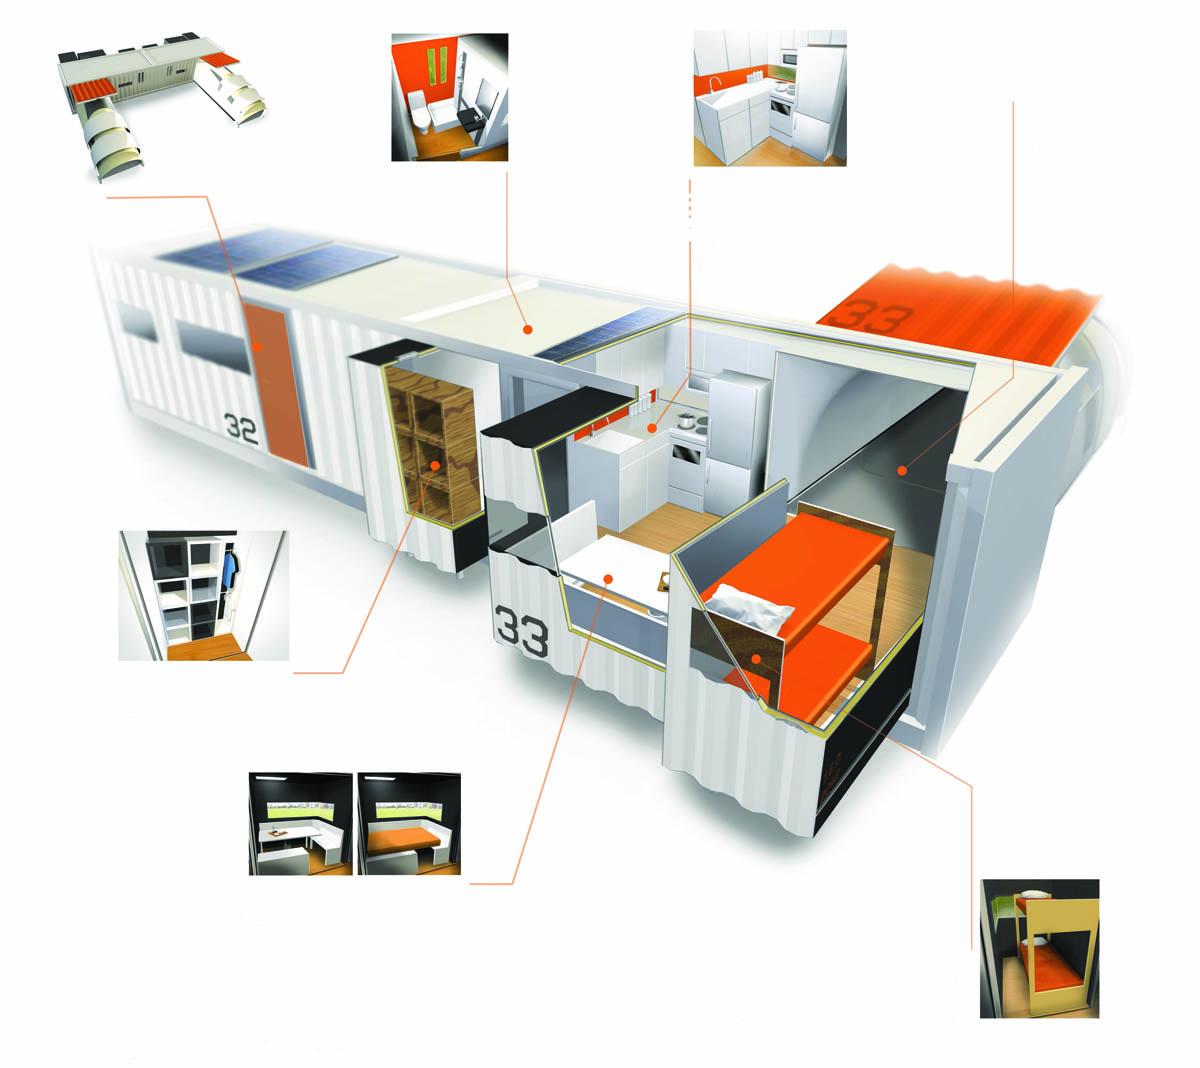 Craig Mackiewicz-Senior Product Studio - Katrina Tempory Housing